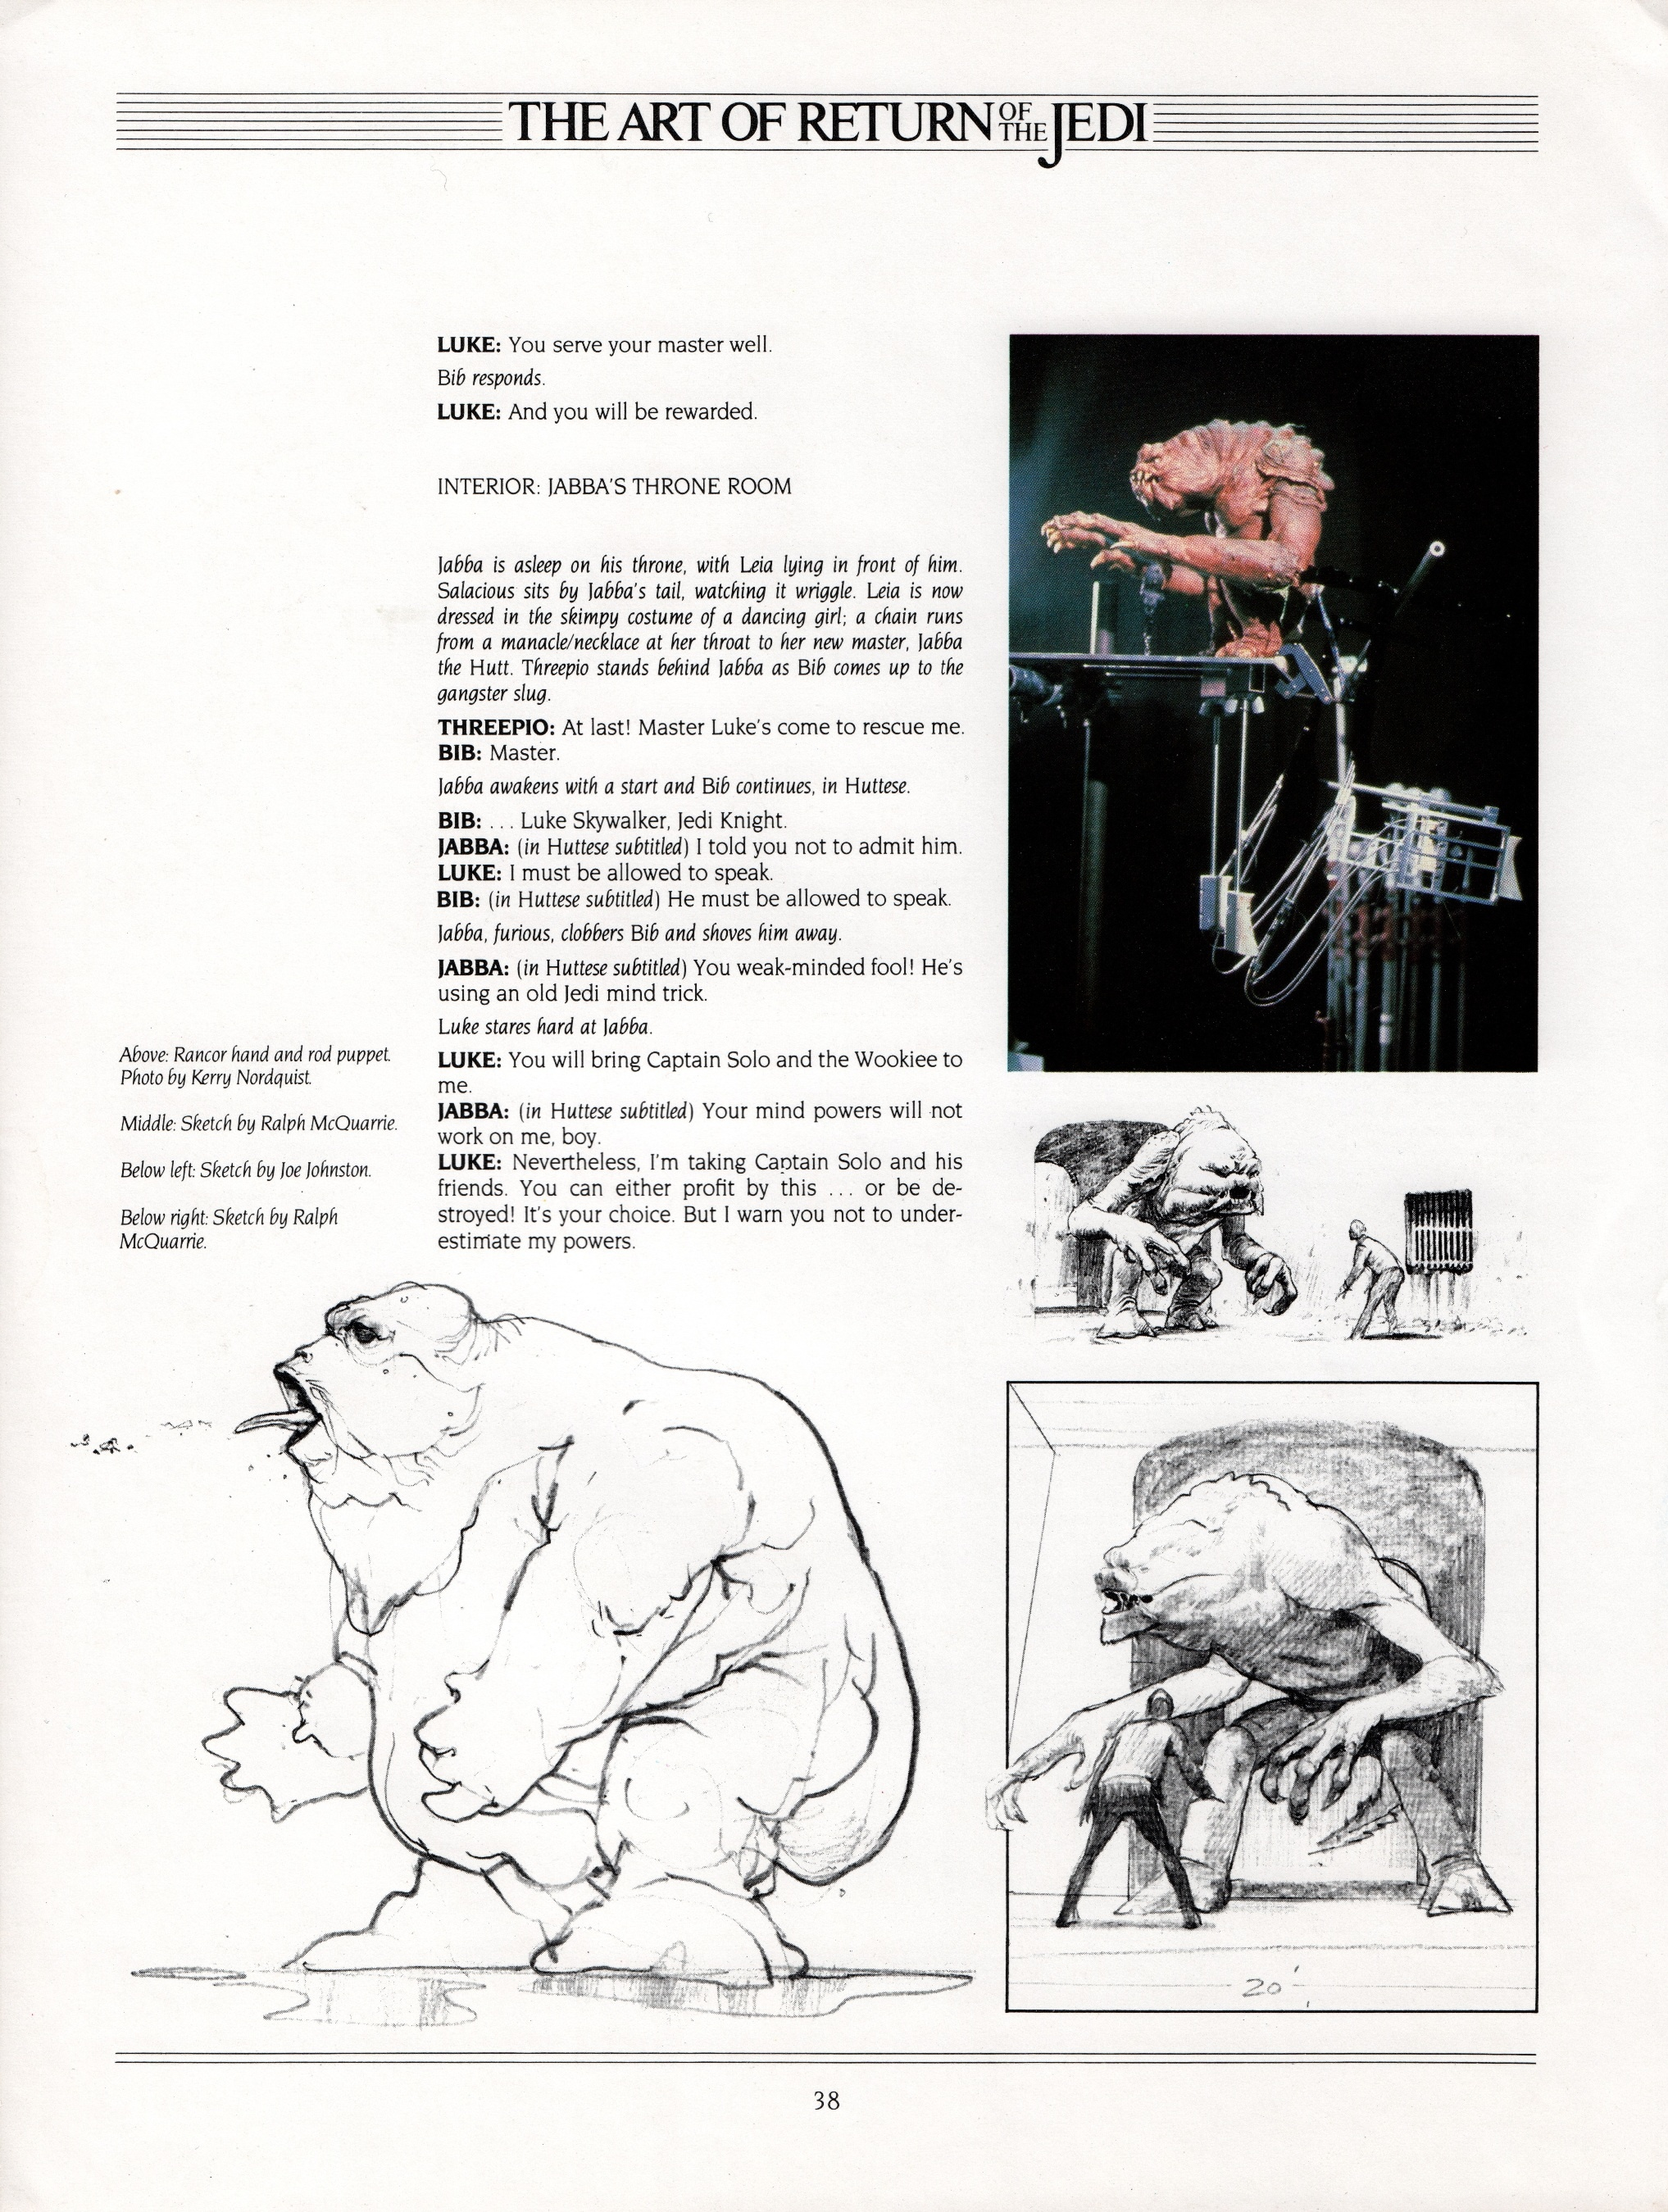 Art of Return of the Jedi (b0bafett_Empire)-p038